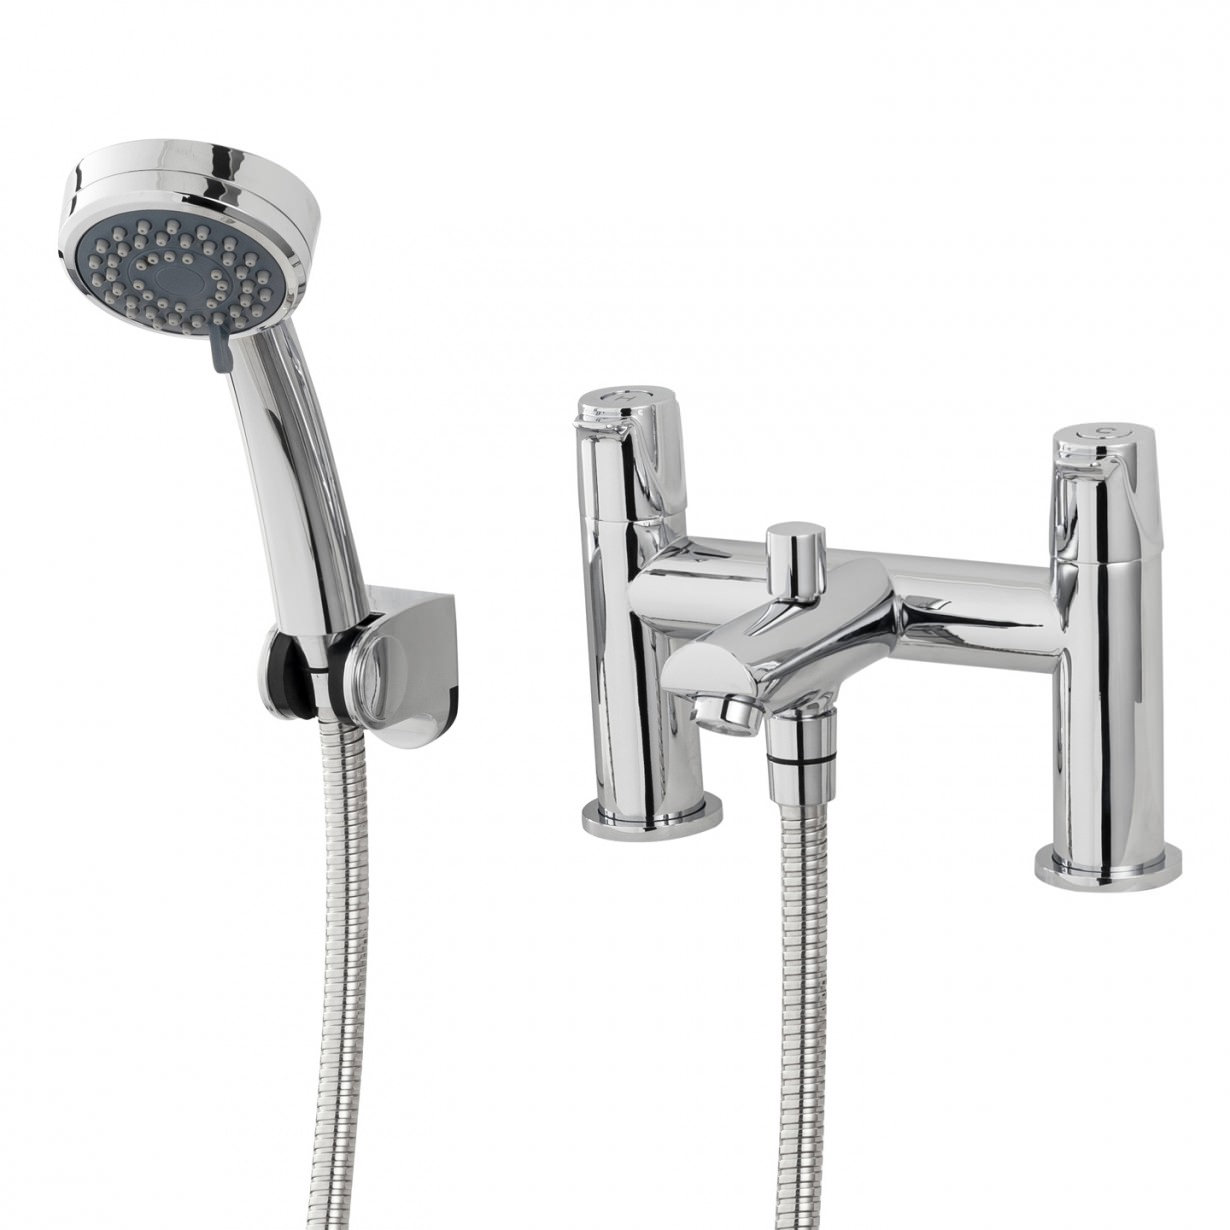 triton dene bath shower mixer tap with handset and hose. Black Bedroom Furniture Sets. Home Design Ideas